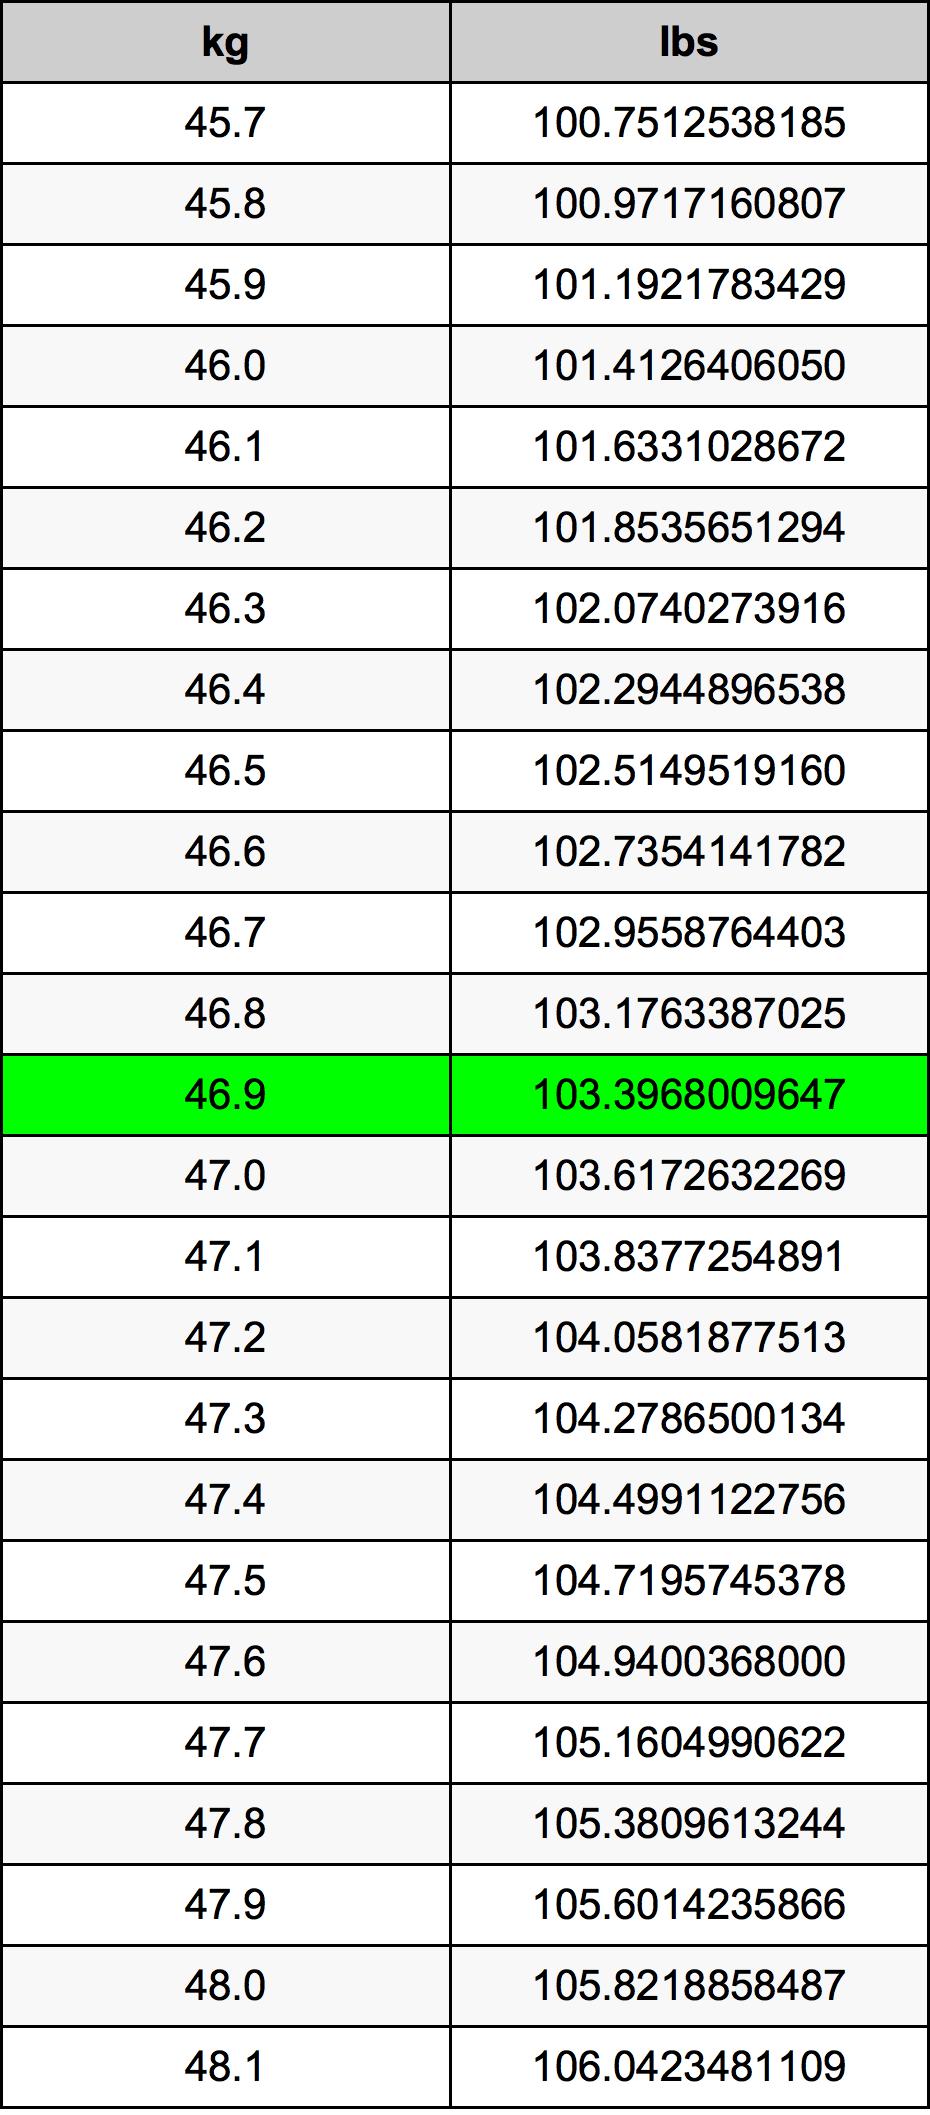 46.9 Kilogram tabelul de conversie